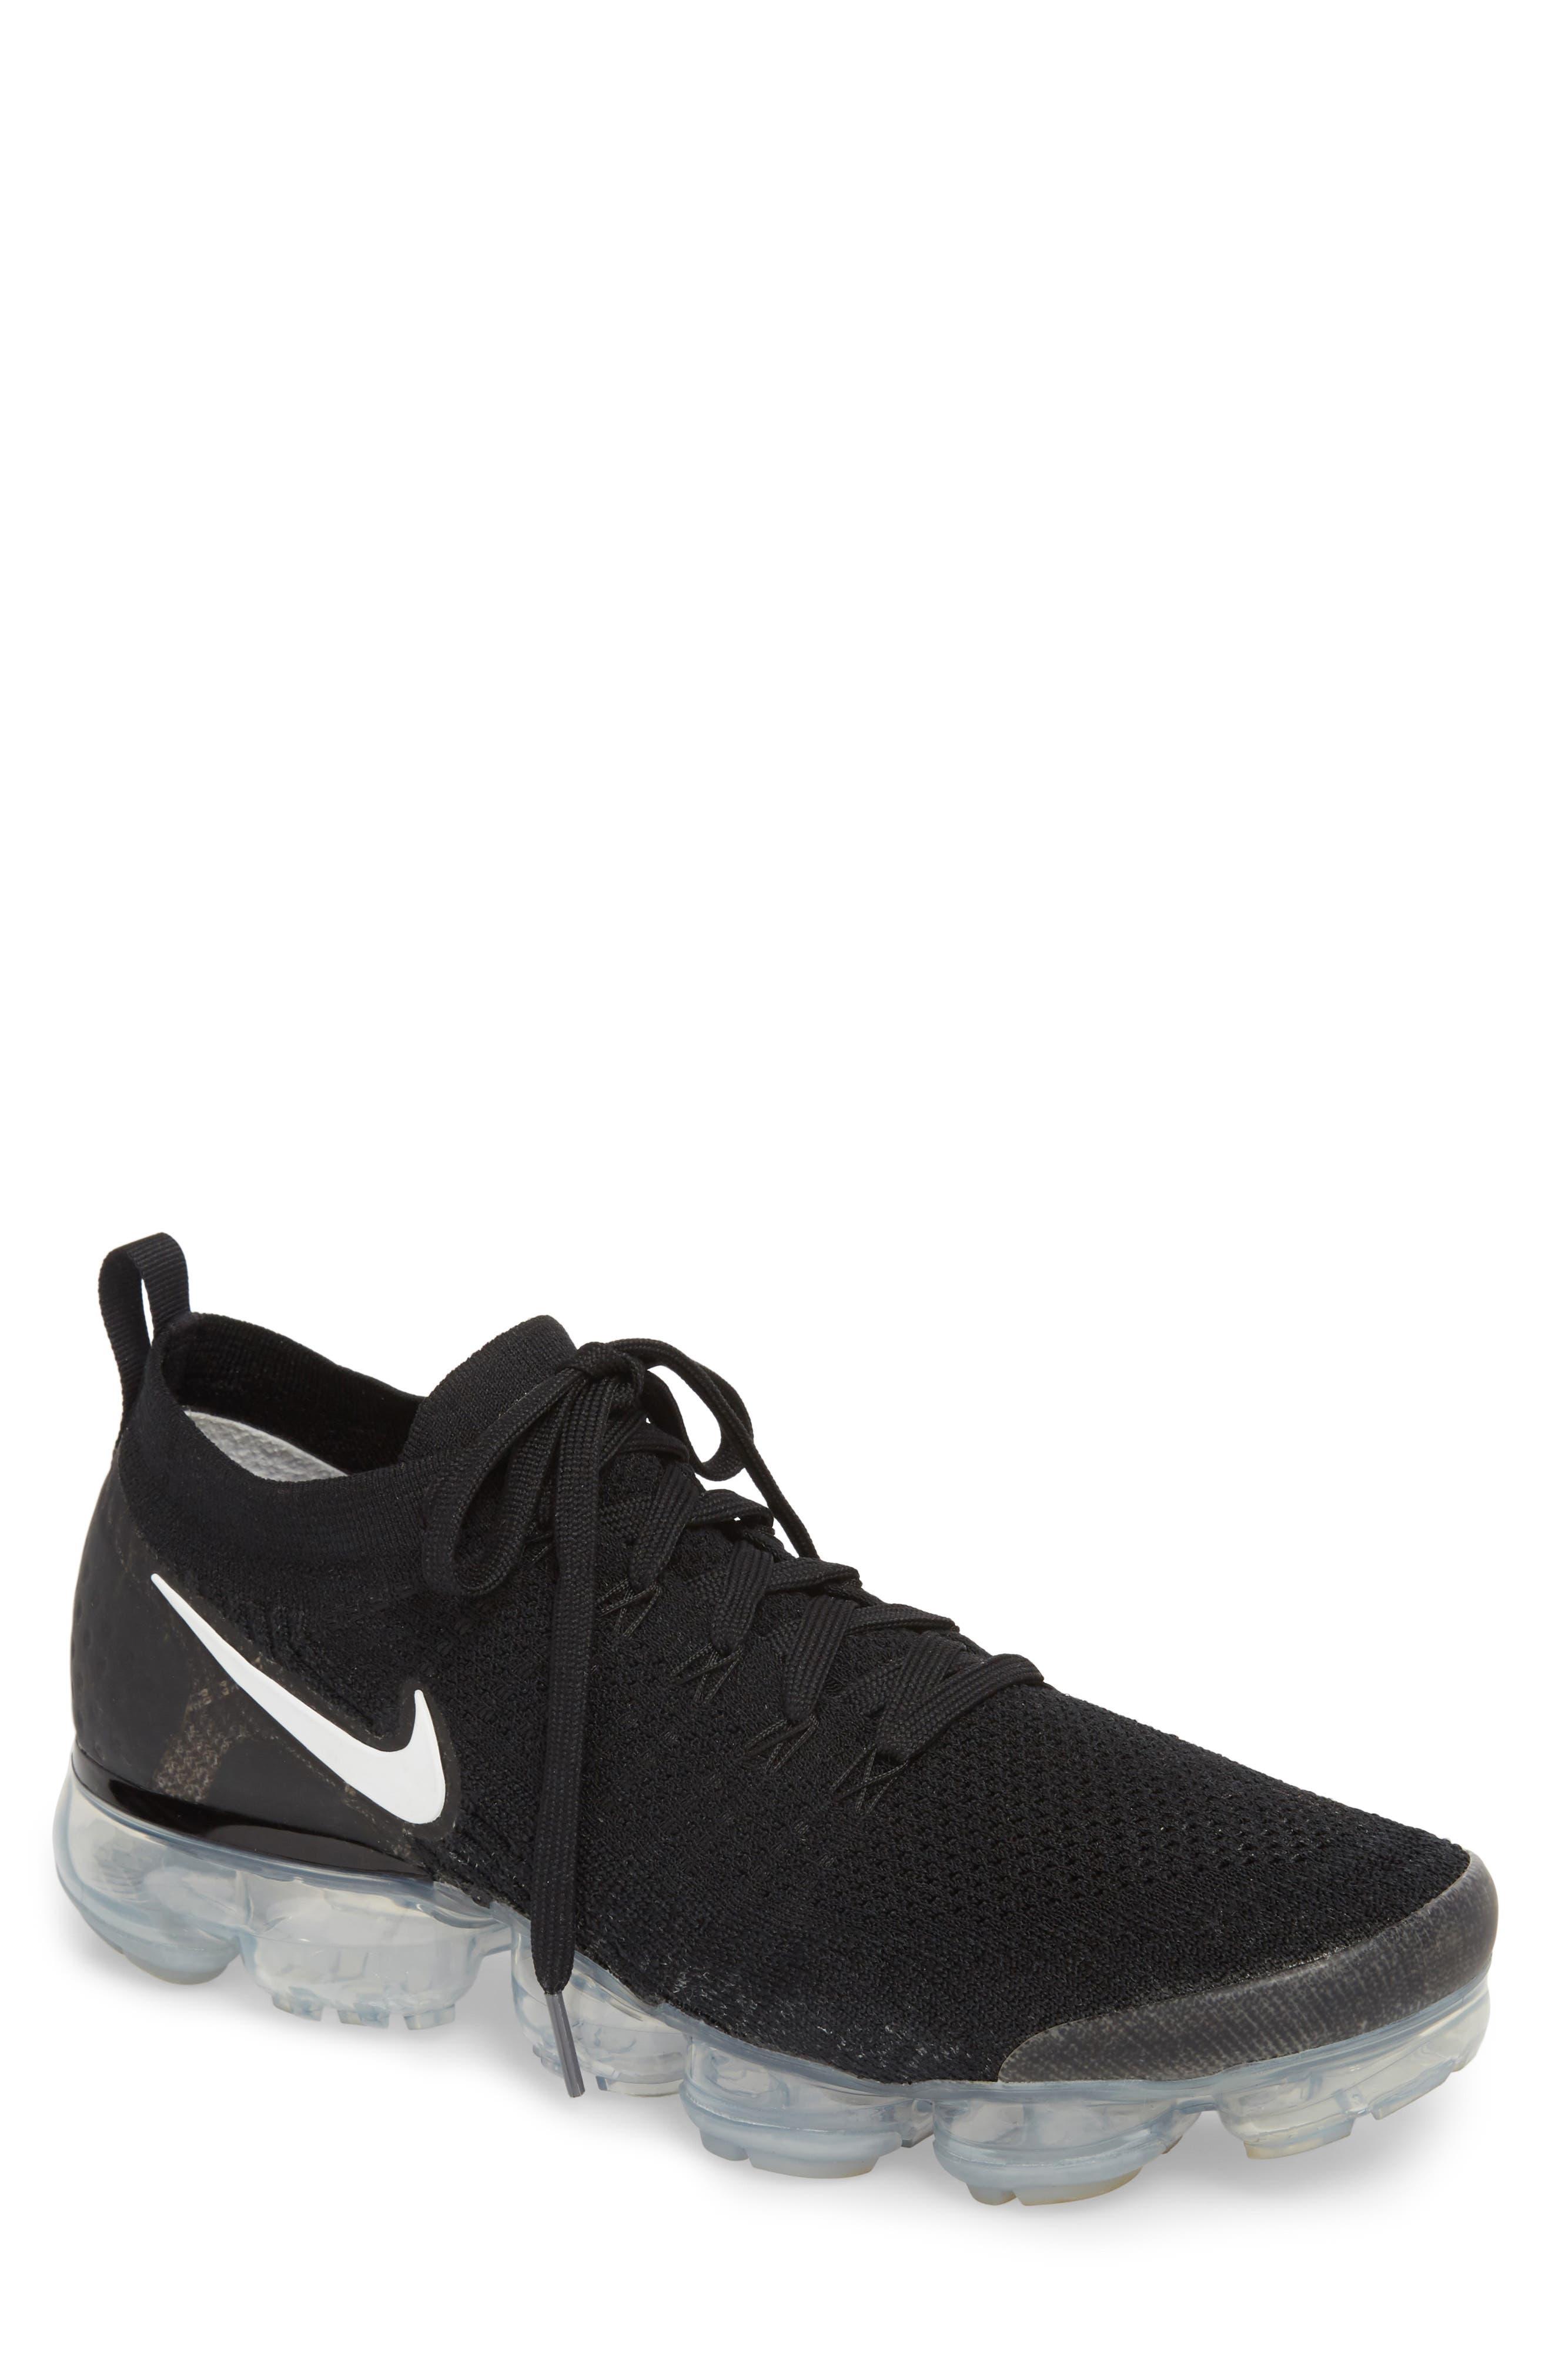 Air Vapormax Flyknit 2 Running Shoe,                             Main thumbnail 1, color,                             Black/ White/ Dark Grey